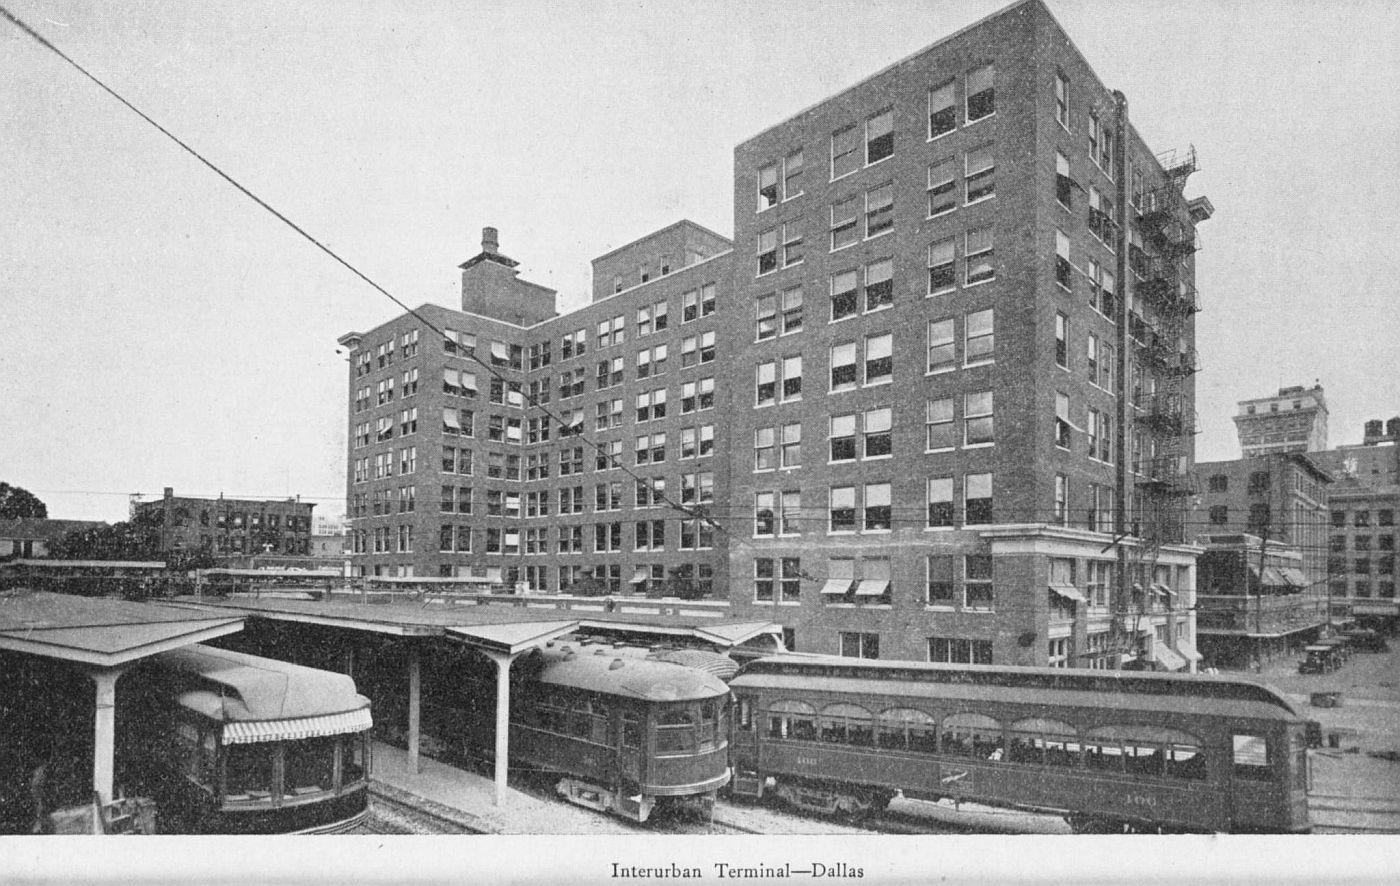 interurban-terminal_1925_neighbors-pamphlet_portal